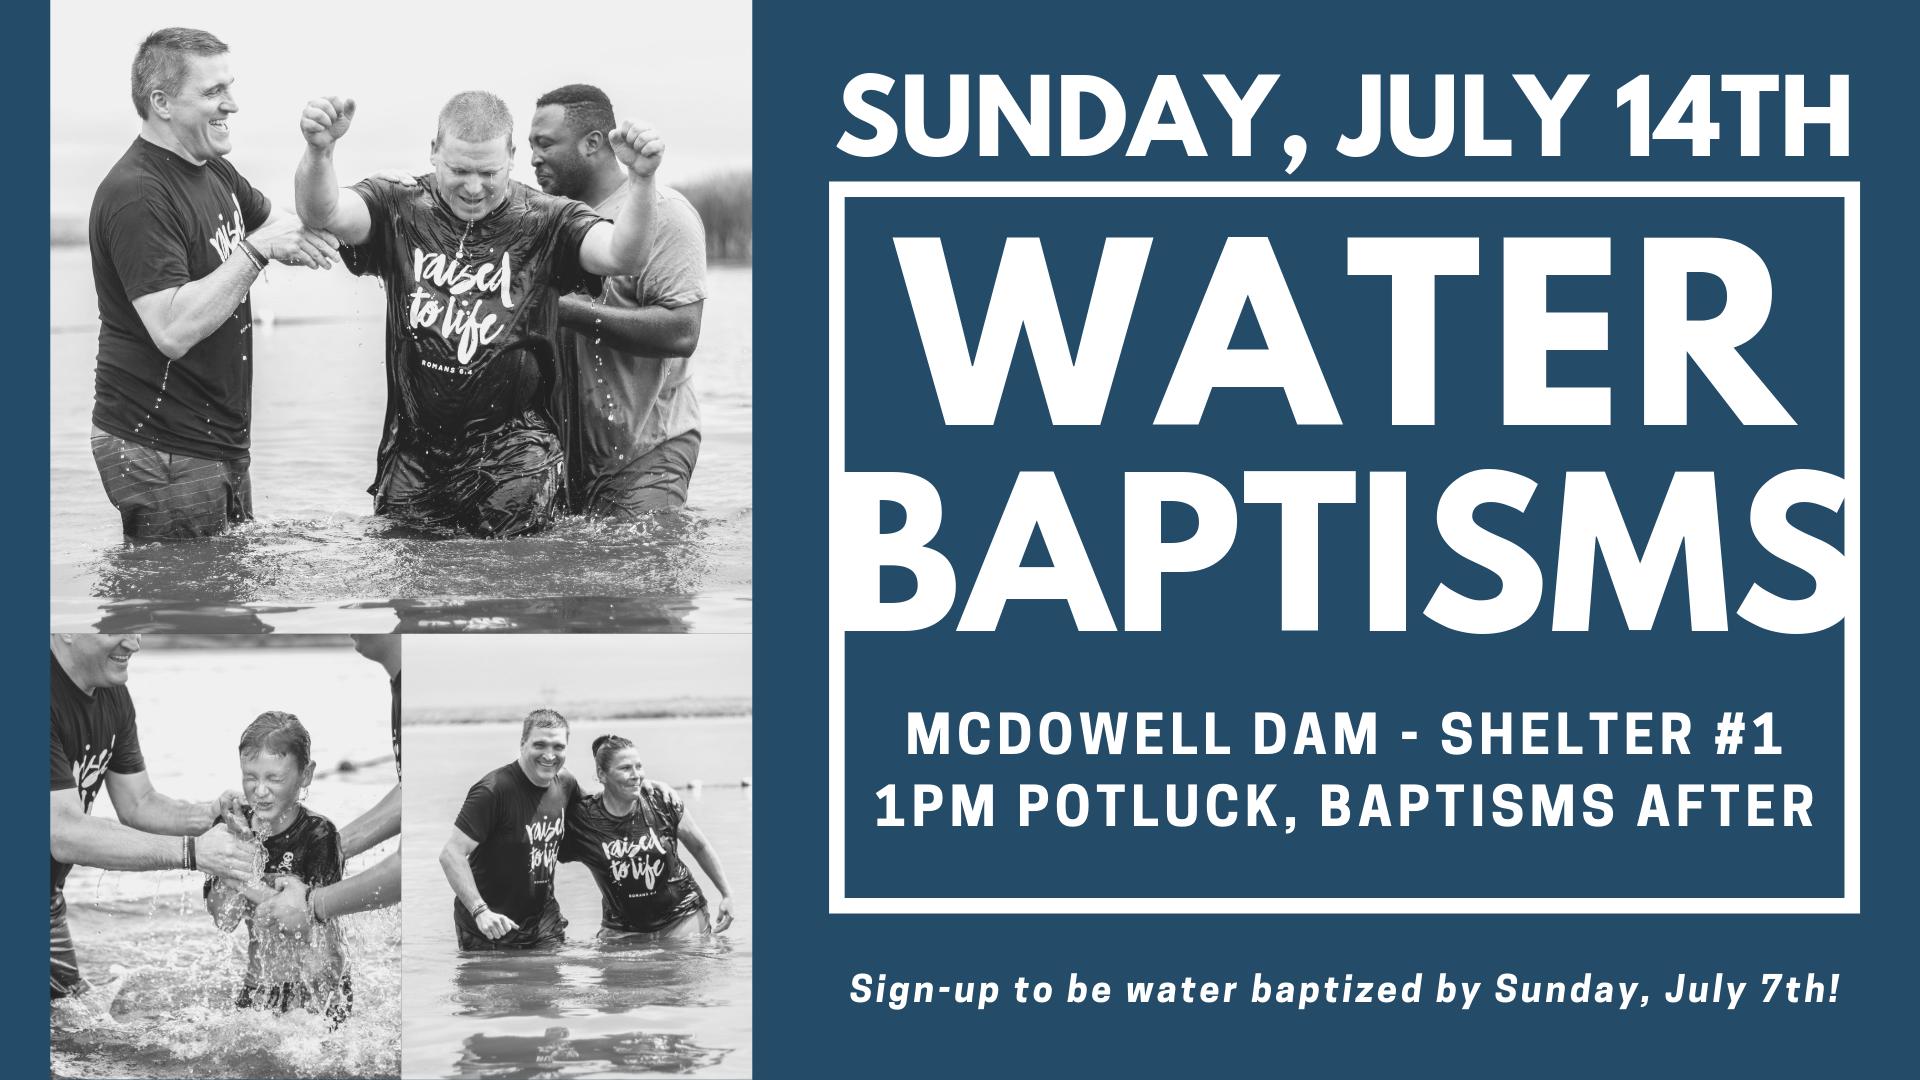 Outdoor Baptisms 2019 at McDowell Dam [7.14.19] slide.png